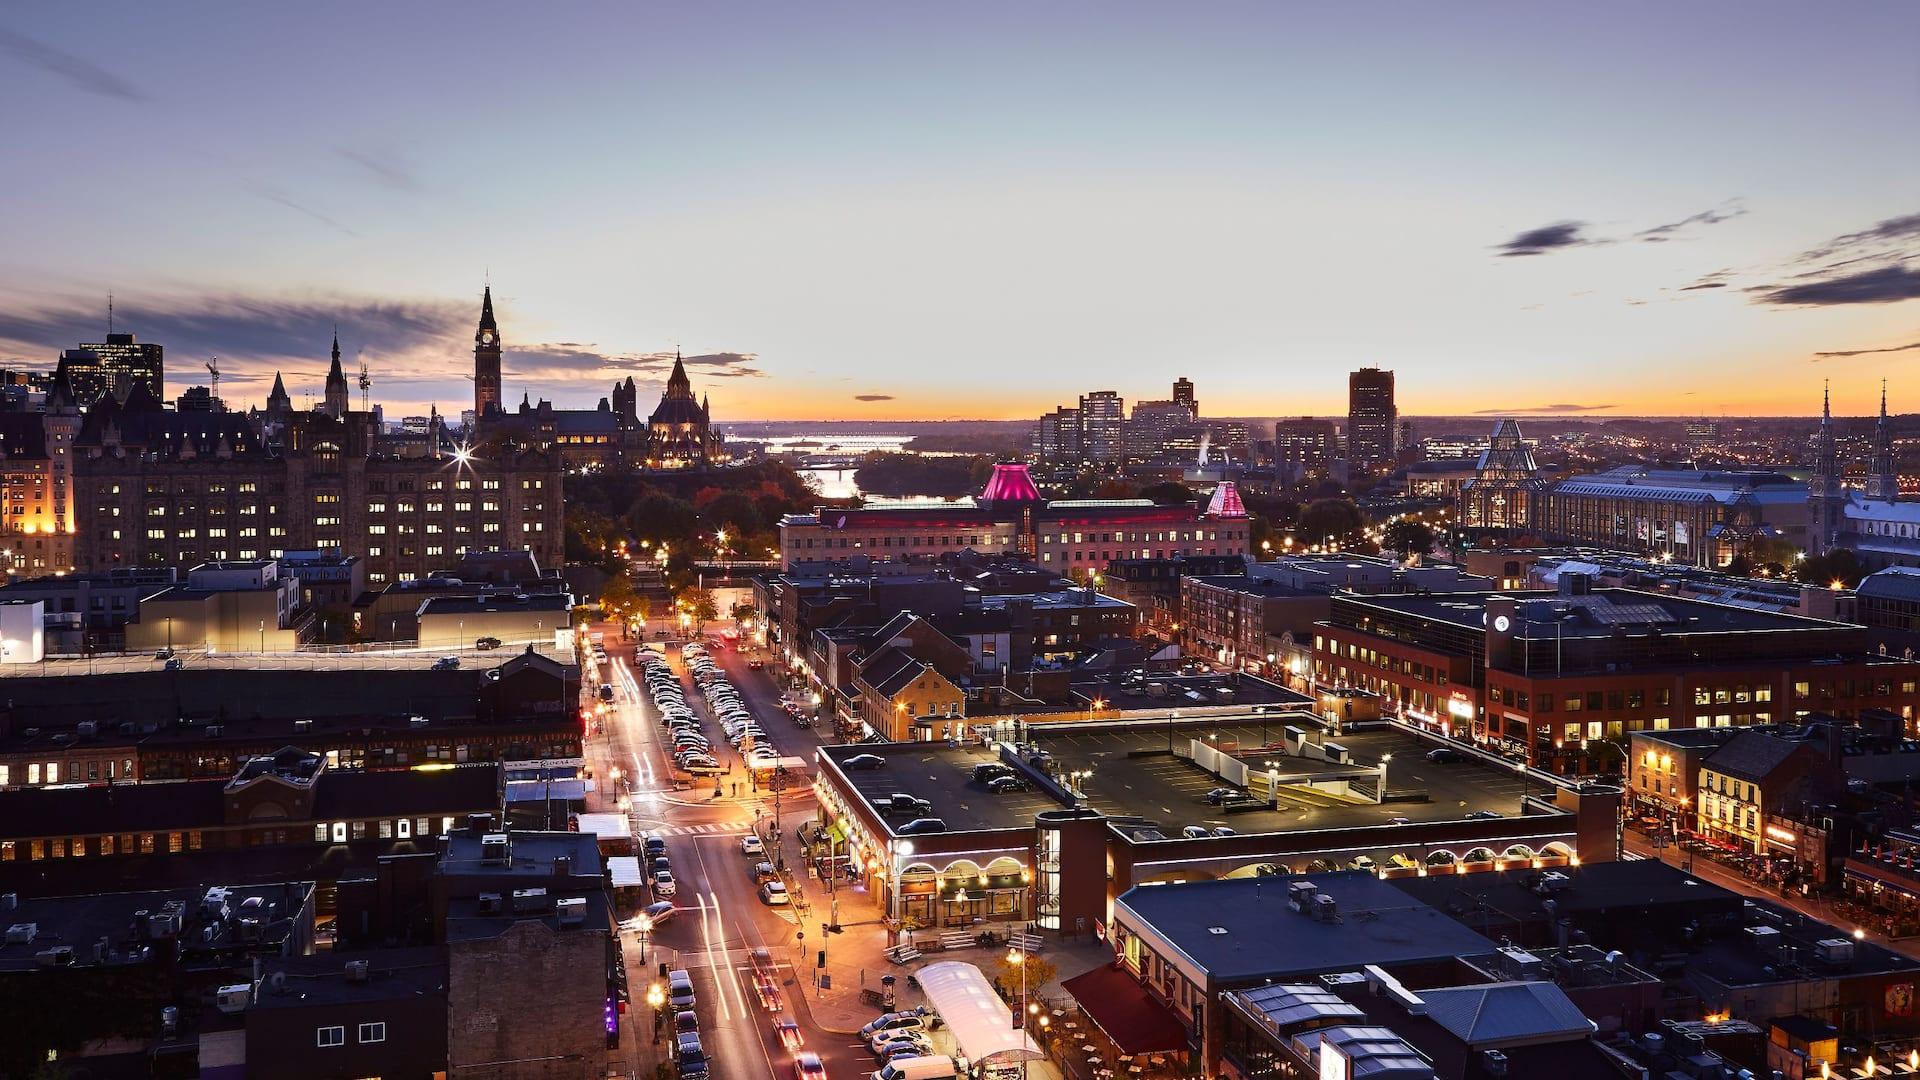 Andaz Ottawa View